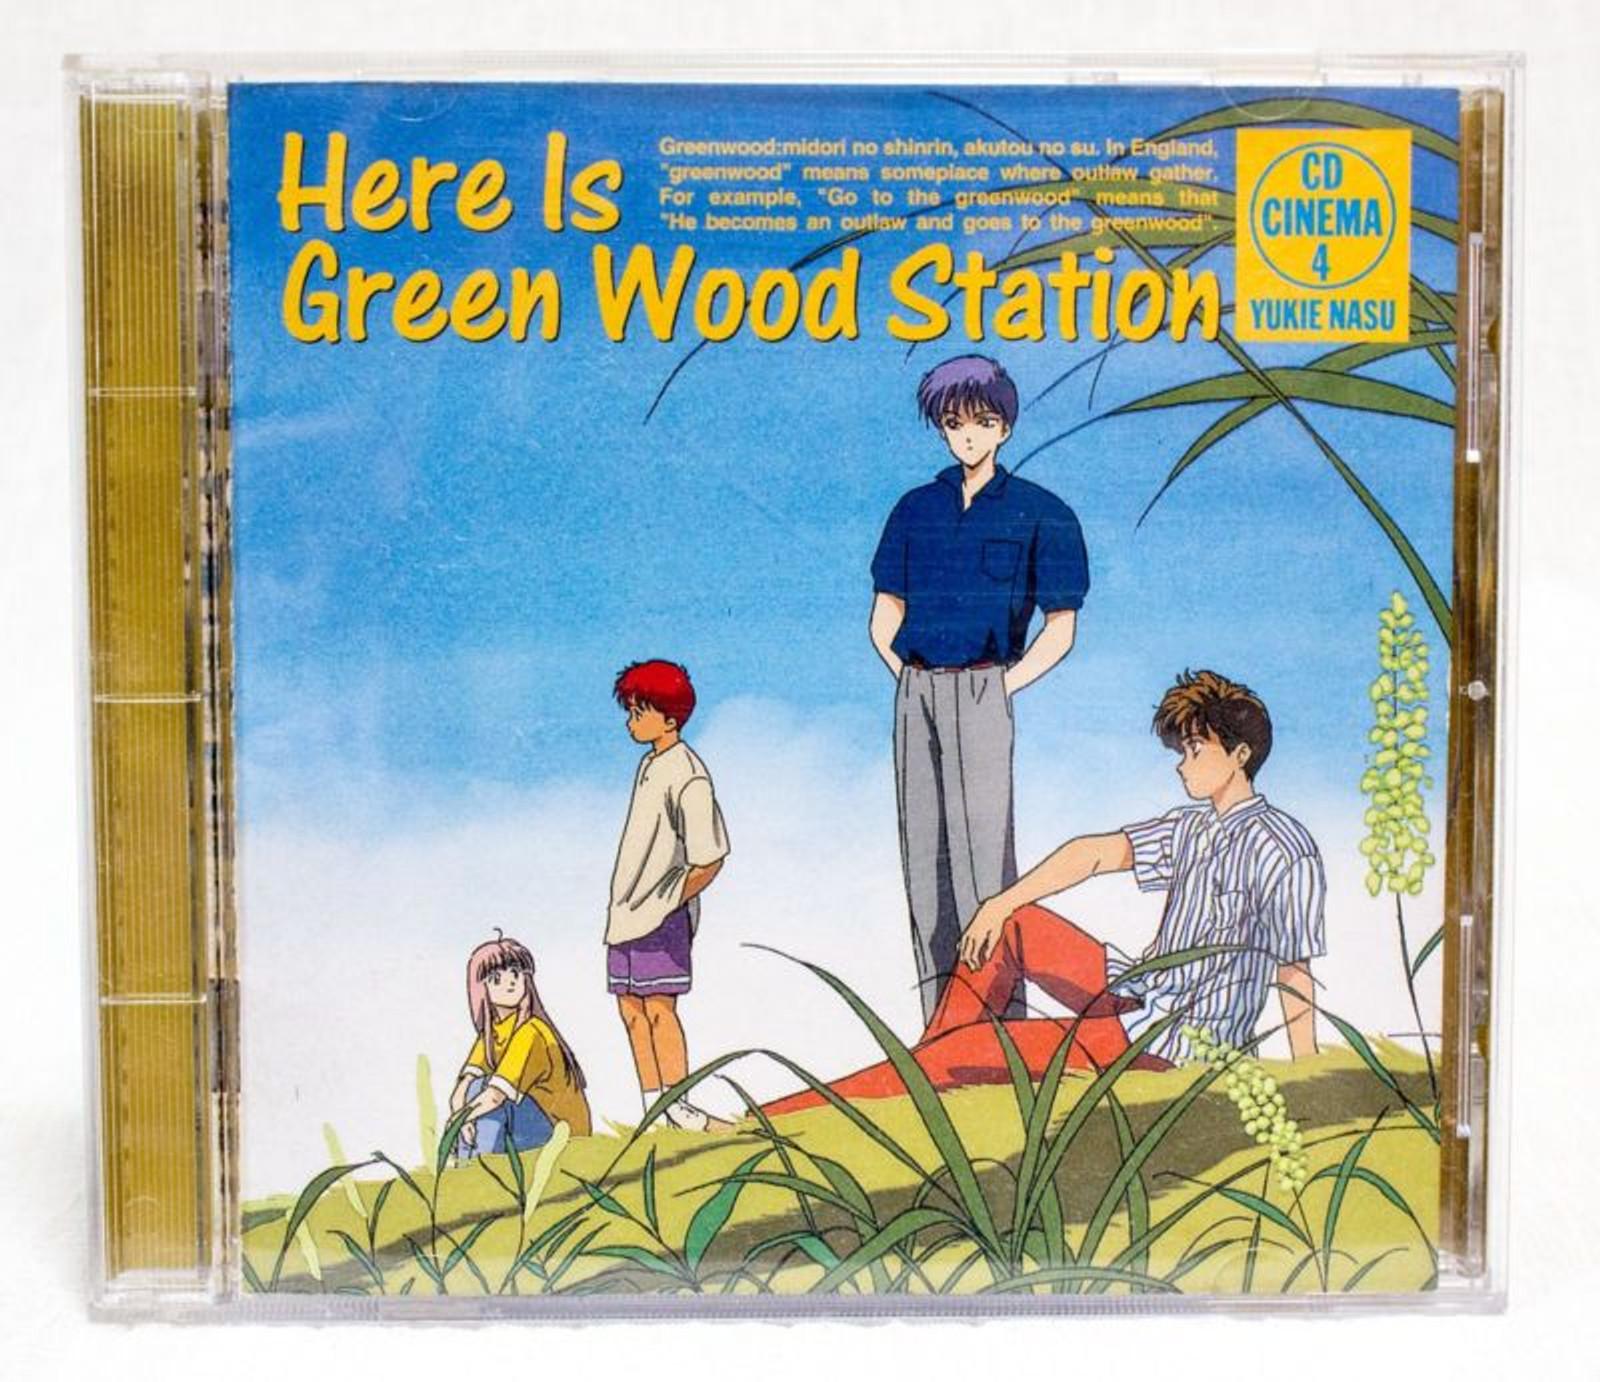 Here is GreenWood Station CD Cinema 4 Yukie Nasu JAPAN ANIME